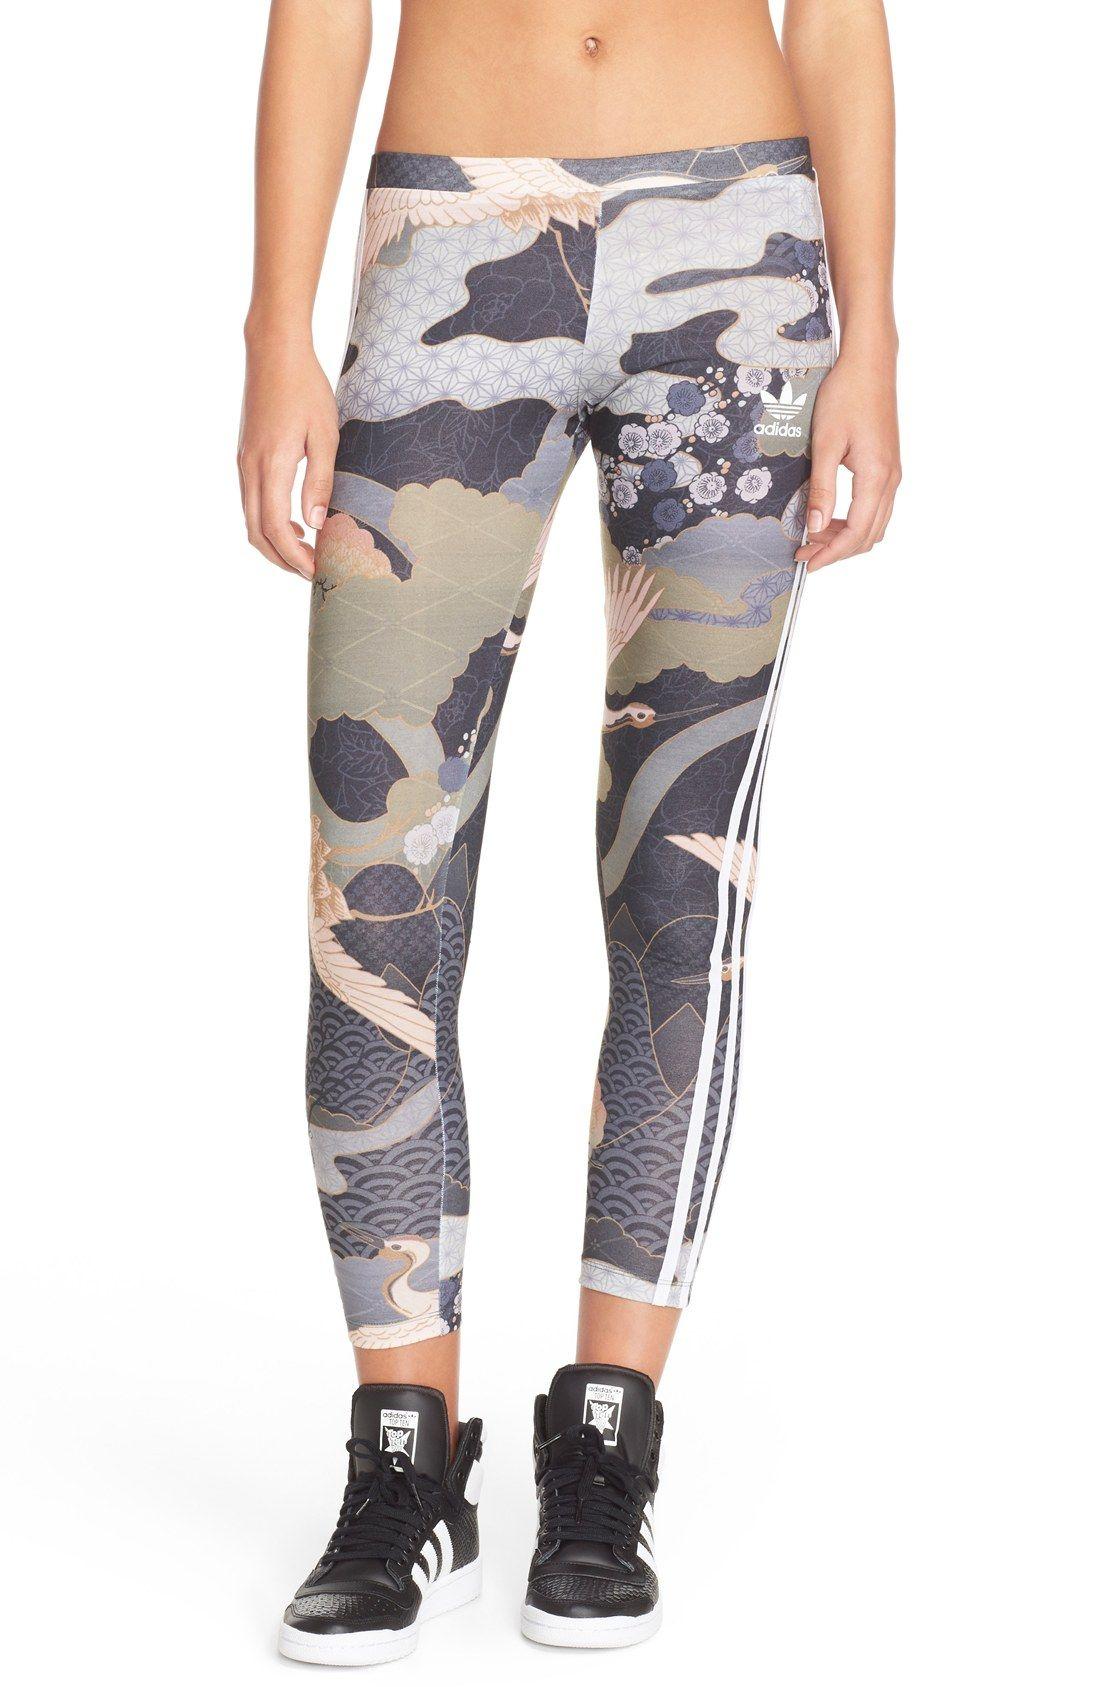 adidas Originals 'Kimono Print' 3-Stripes Leggings